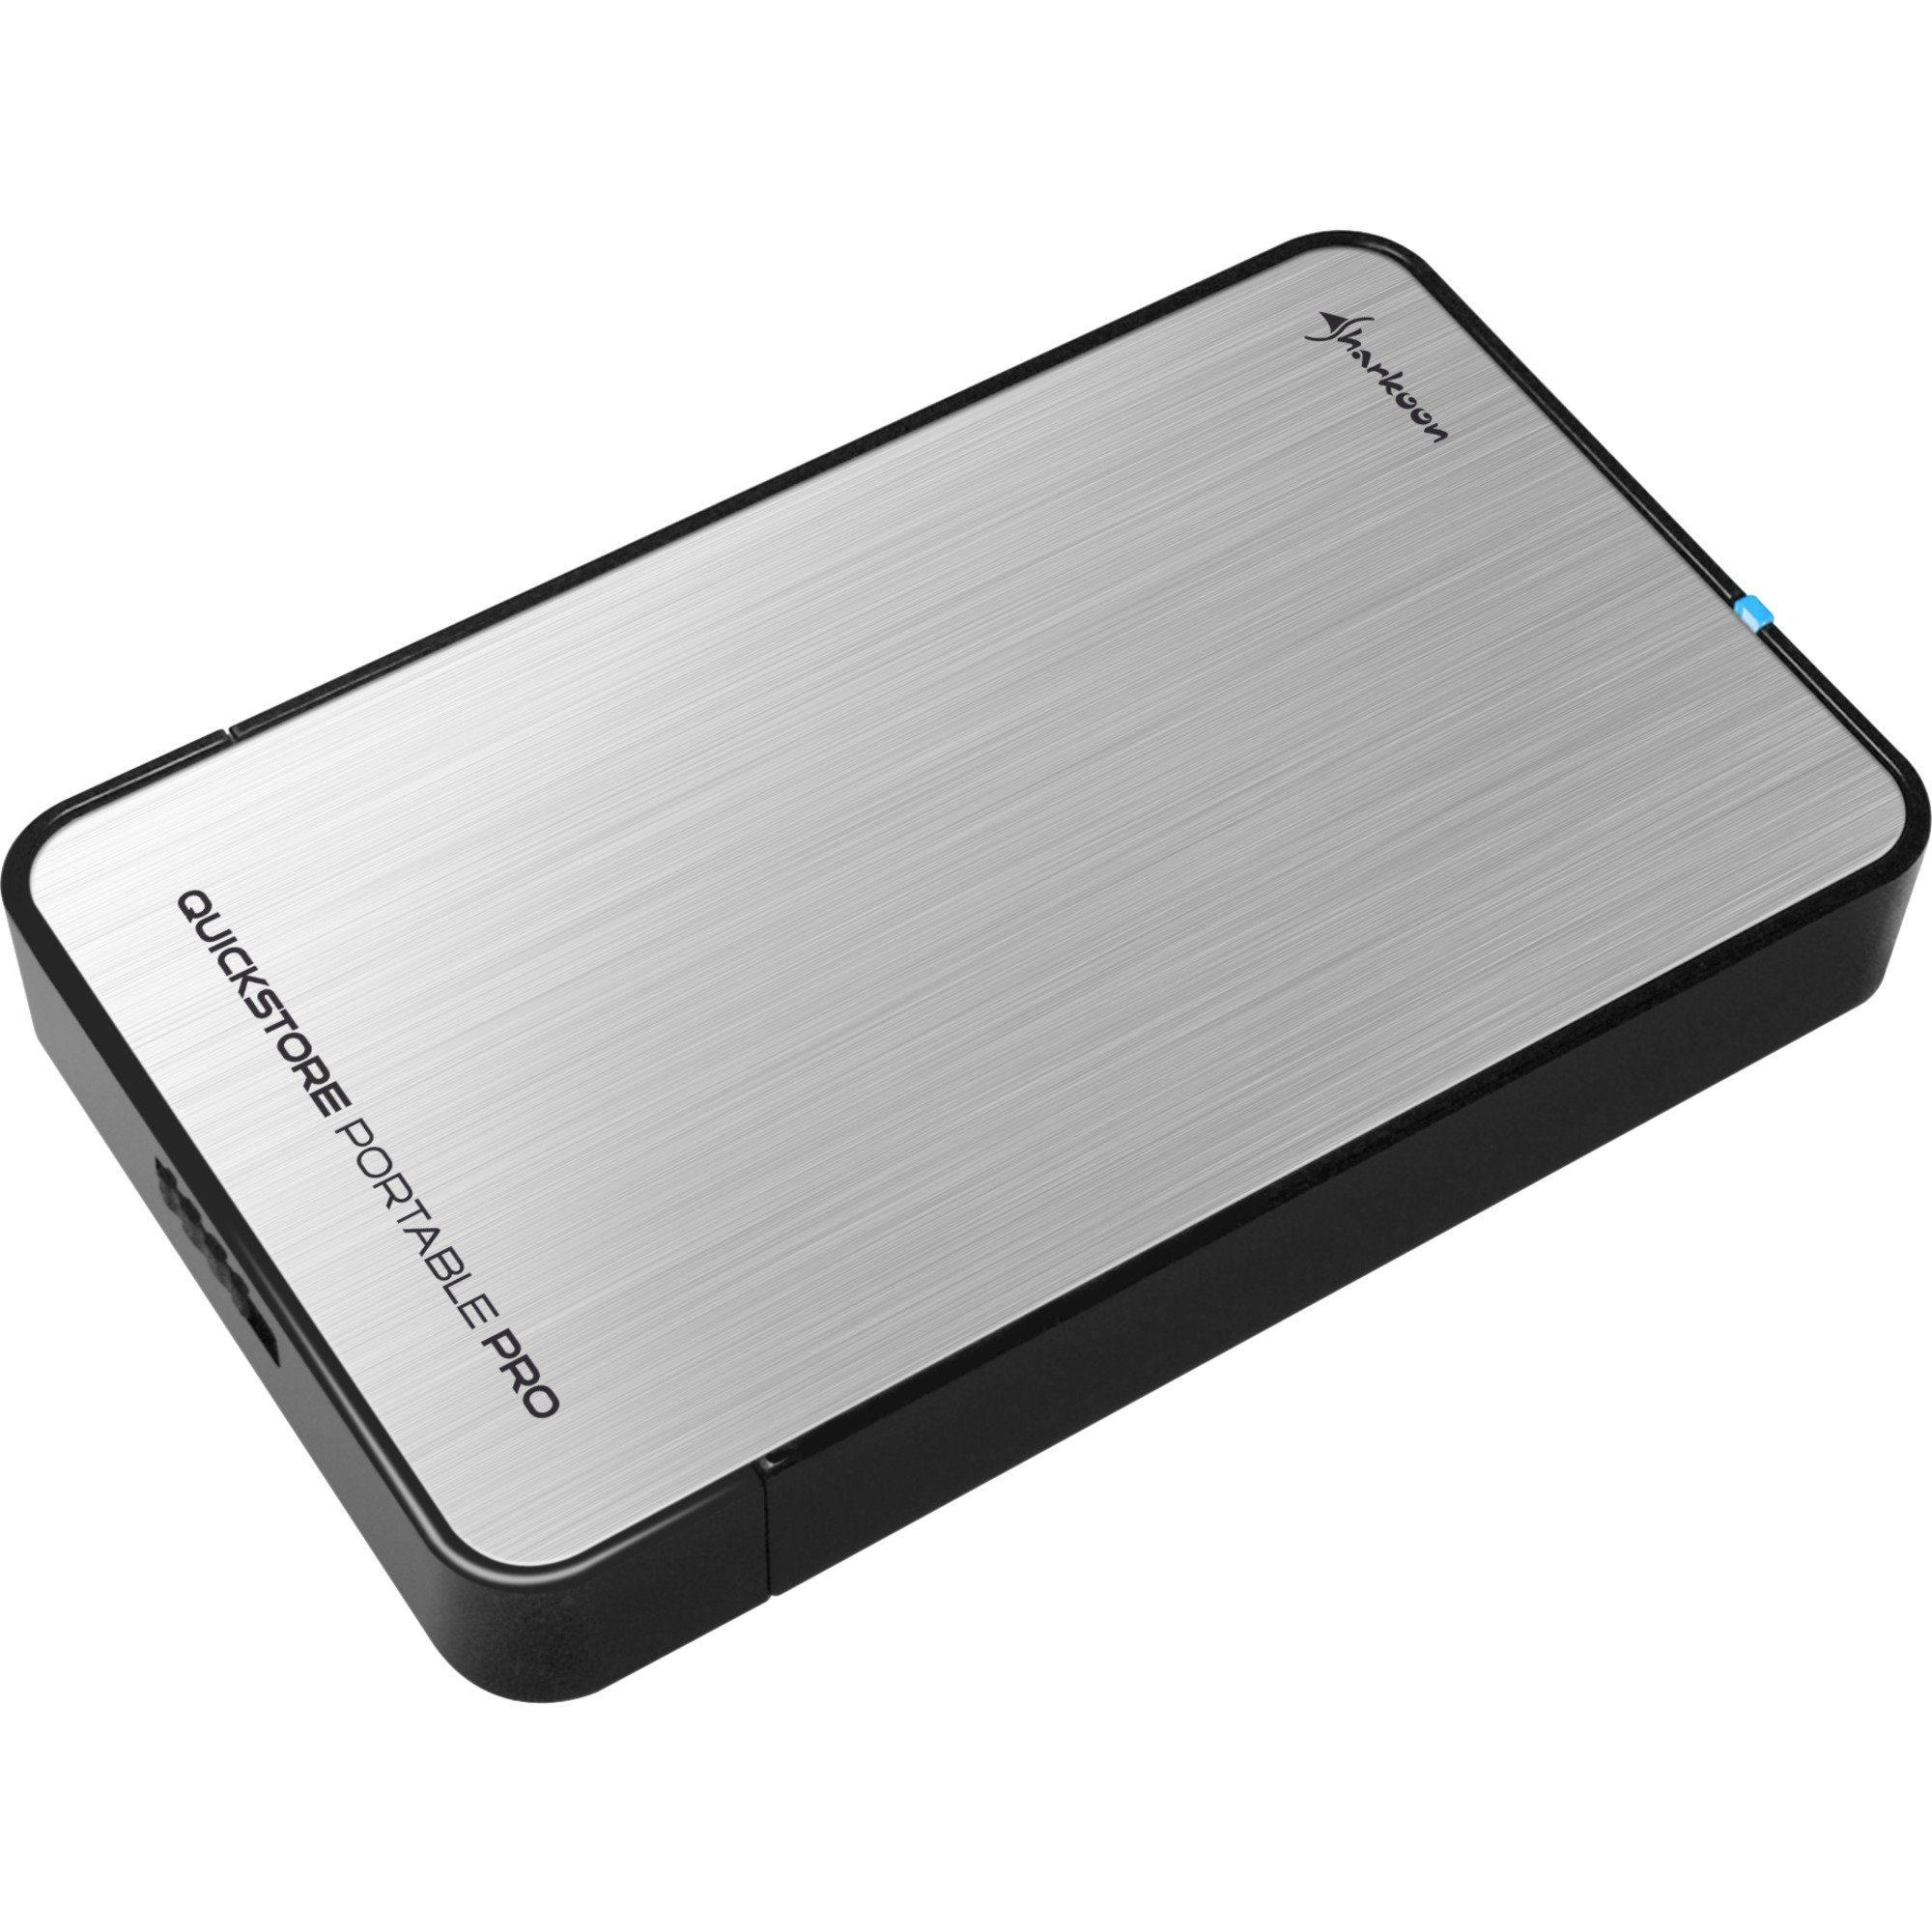 Sharkoon Laufwerksgehäuse »QuickStore Portable Pro USB3.0«